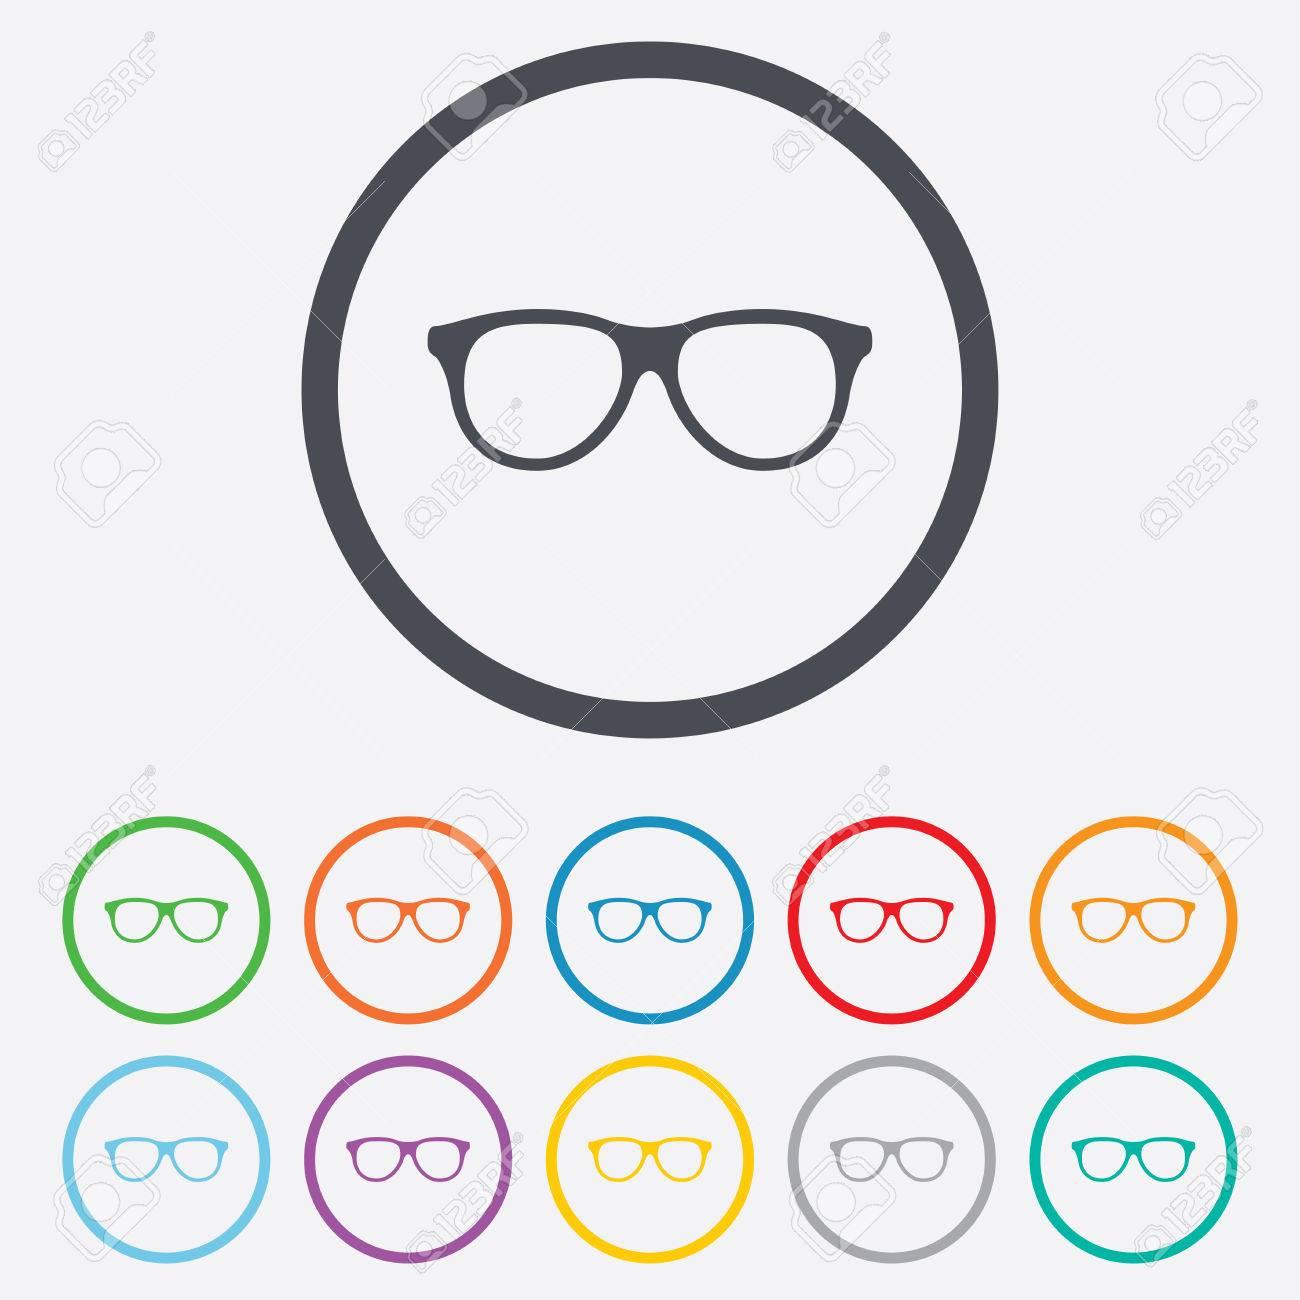 Vidrios Retros Firman Icono. Símbolo De Montura De Gafas. Botones De ...